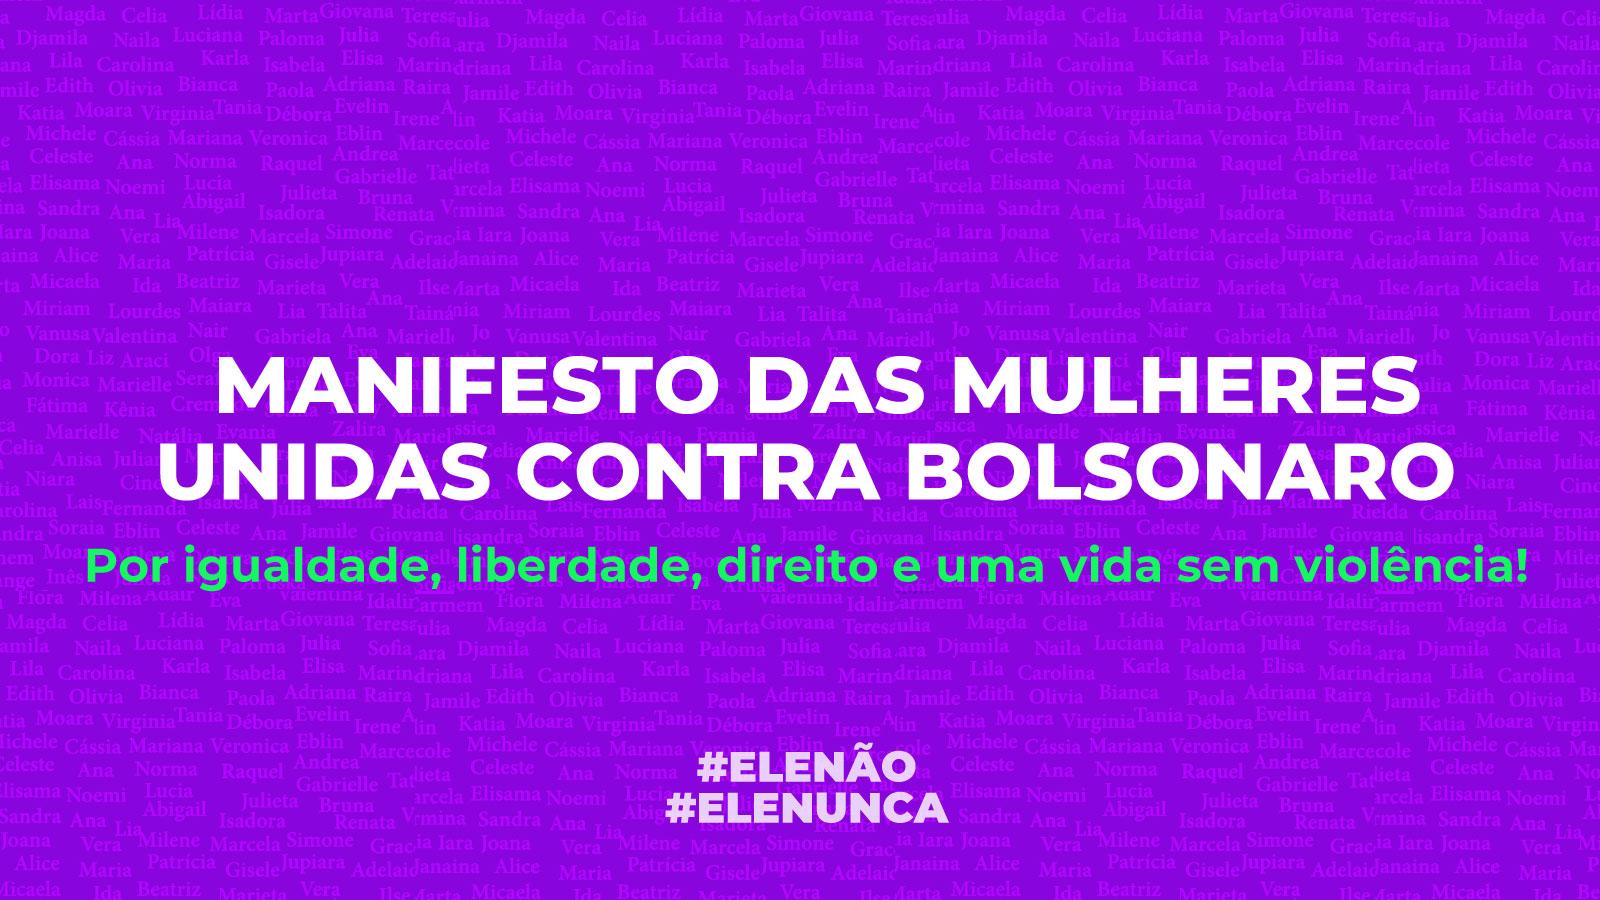 Manifesto das mulheres unidas contra bolsonaro